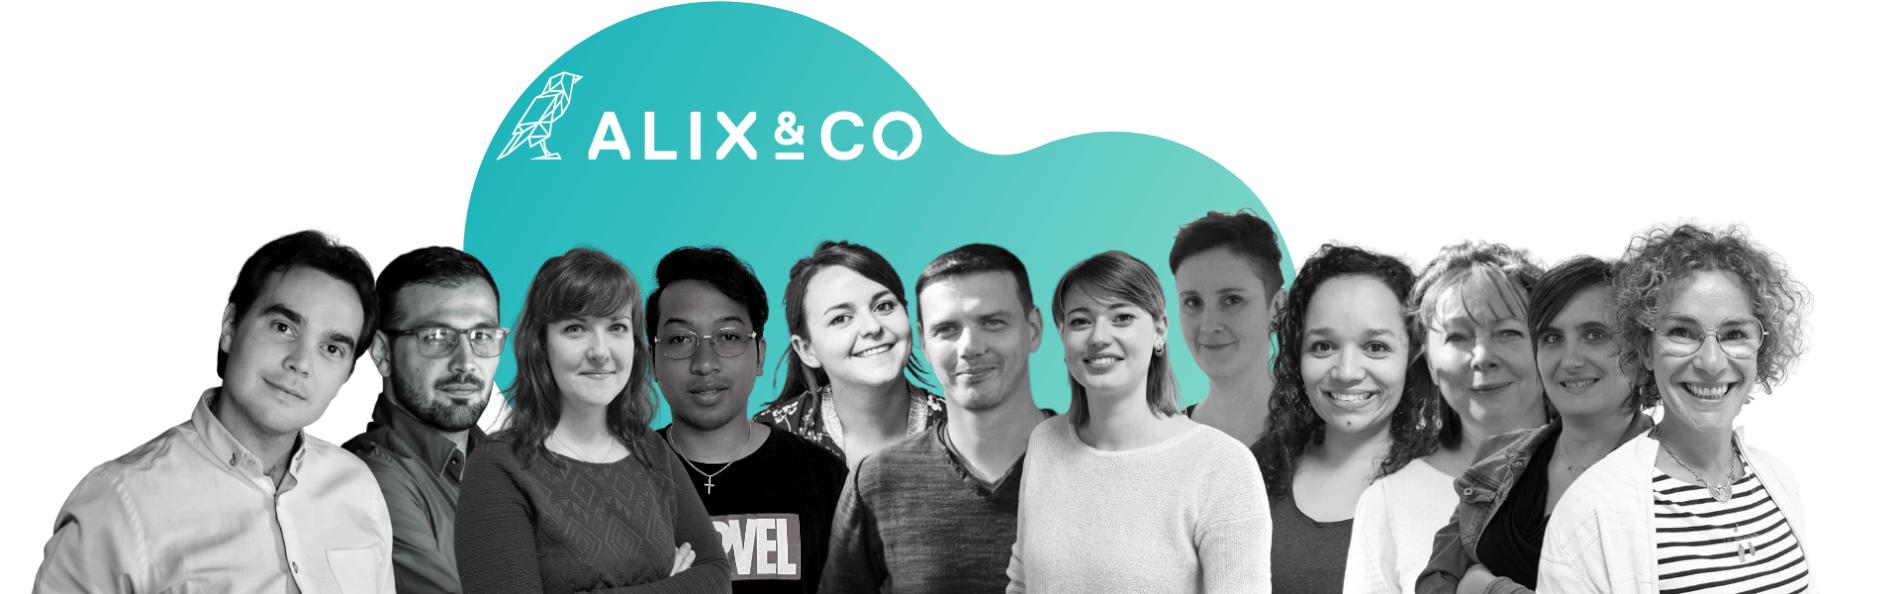 Alix&Co Team